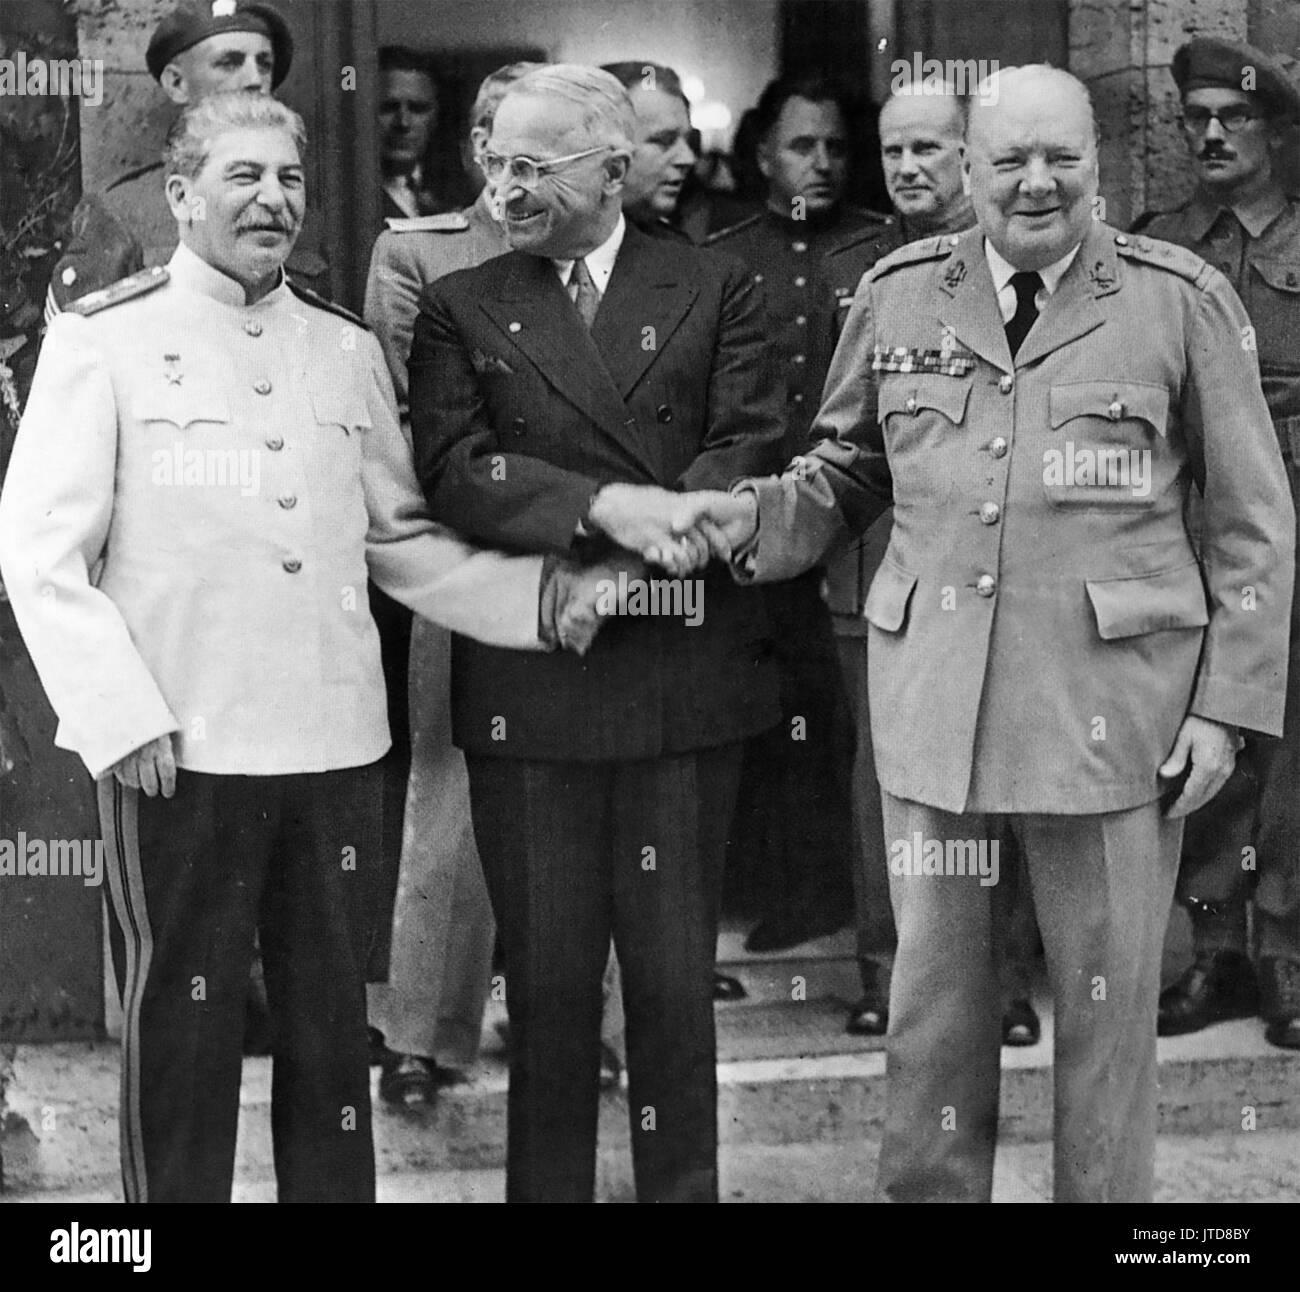 POTSDAM CONFERENCE July-August 1945. From left: Joseph Stalin, Harry Truman, Winston Churchill - Stock Image